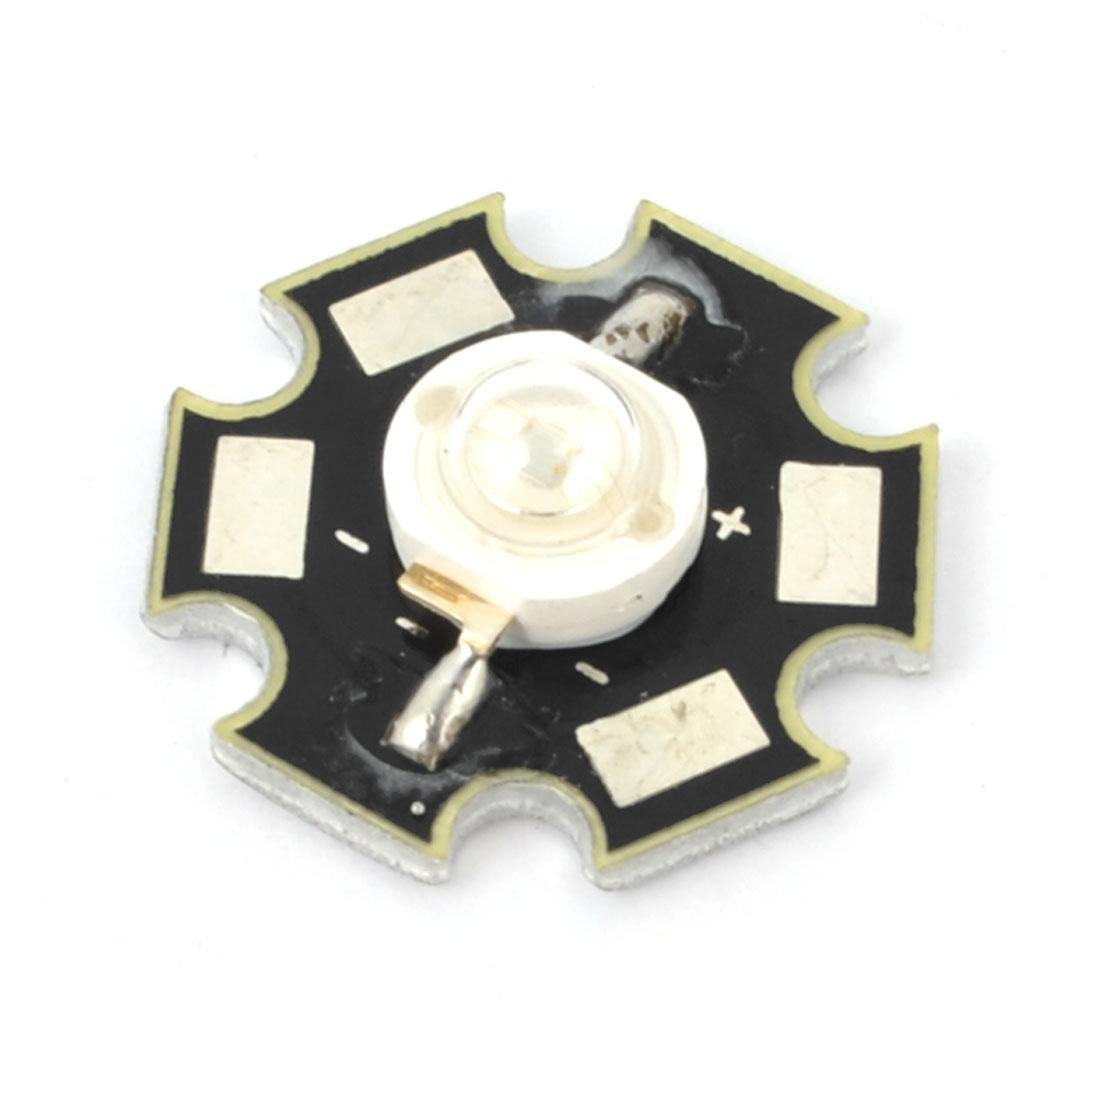 1W 350mA 3.2-3.6V Purple LED Star Emitter Lamp Bead w Heat Sink Base